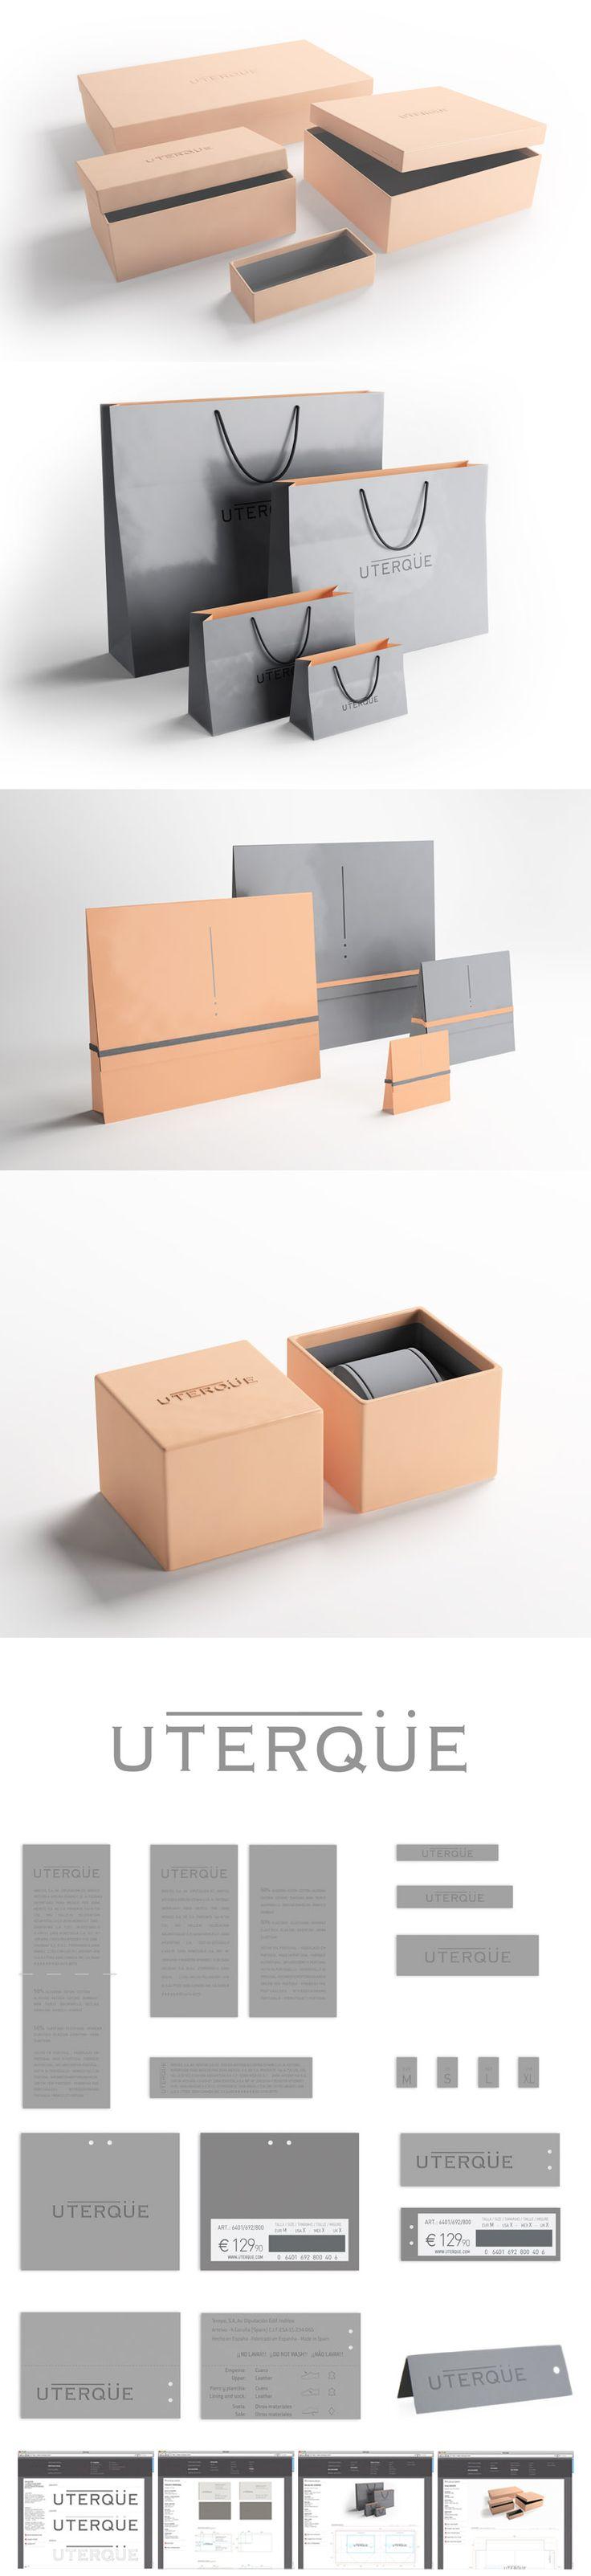 Maxan - Uterqe Nesting box example